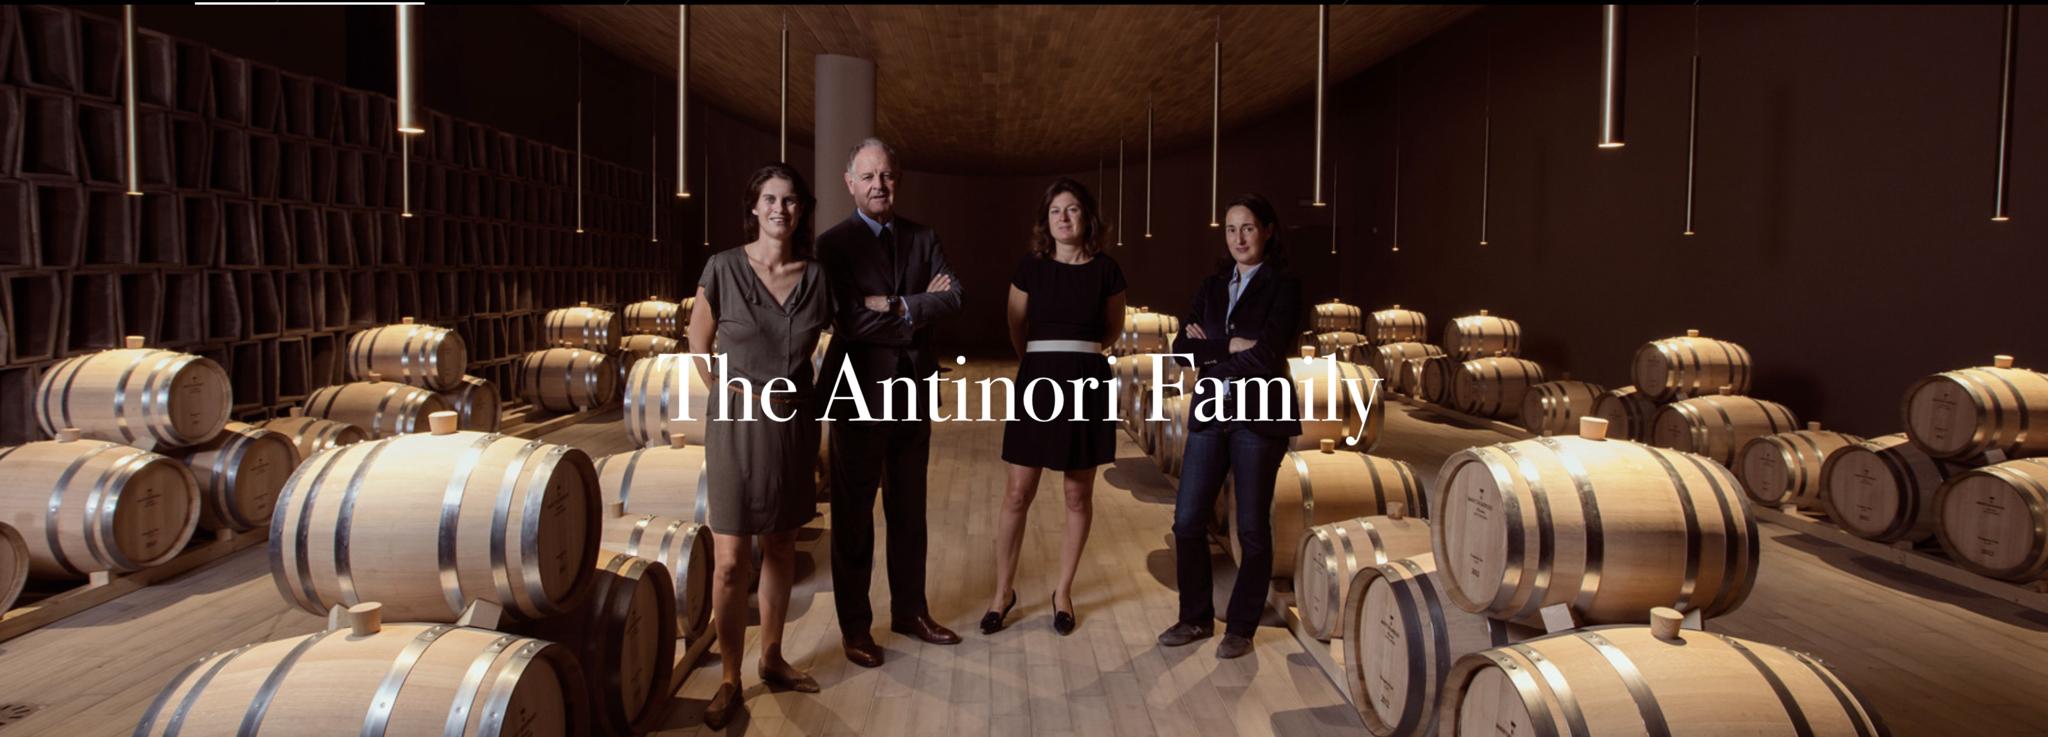 Familie Antinori